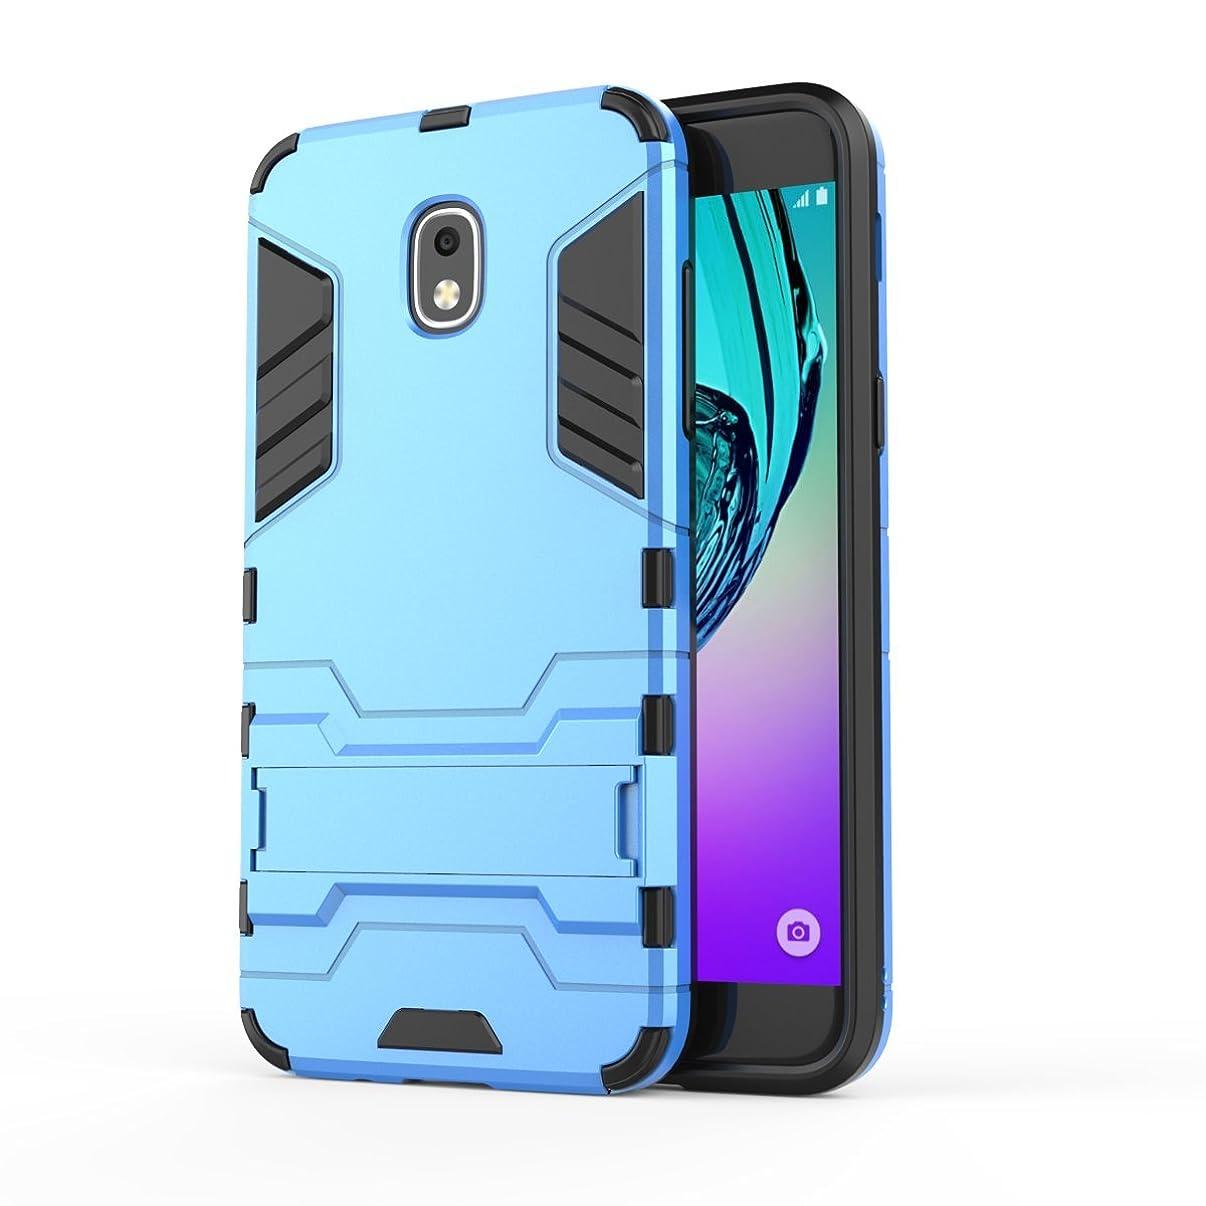 Galaxy J3 2018/J3 Orbit/J3 Achieve/J3 V 3rd Gen/J3 V 2018/Express Prime 3/J3 Prime 2/J3 Emerge 2018/Amp Prime 3/J3 Eclips Case, UZER Dual Layer Hard PC + Soft Silicone Case with Kickstand